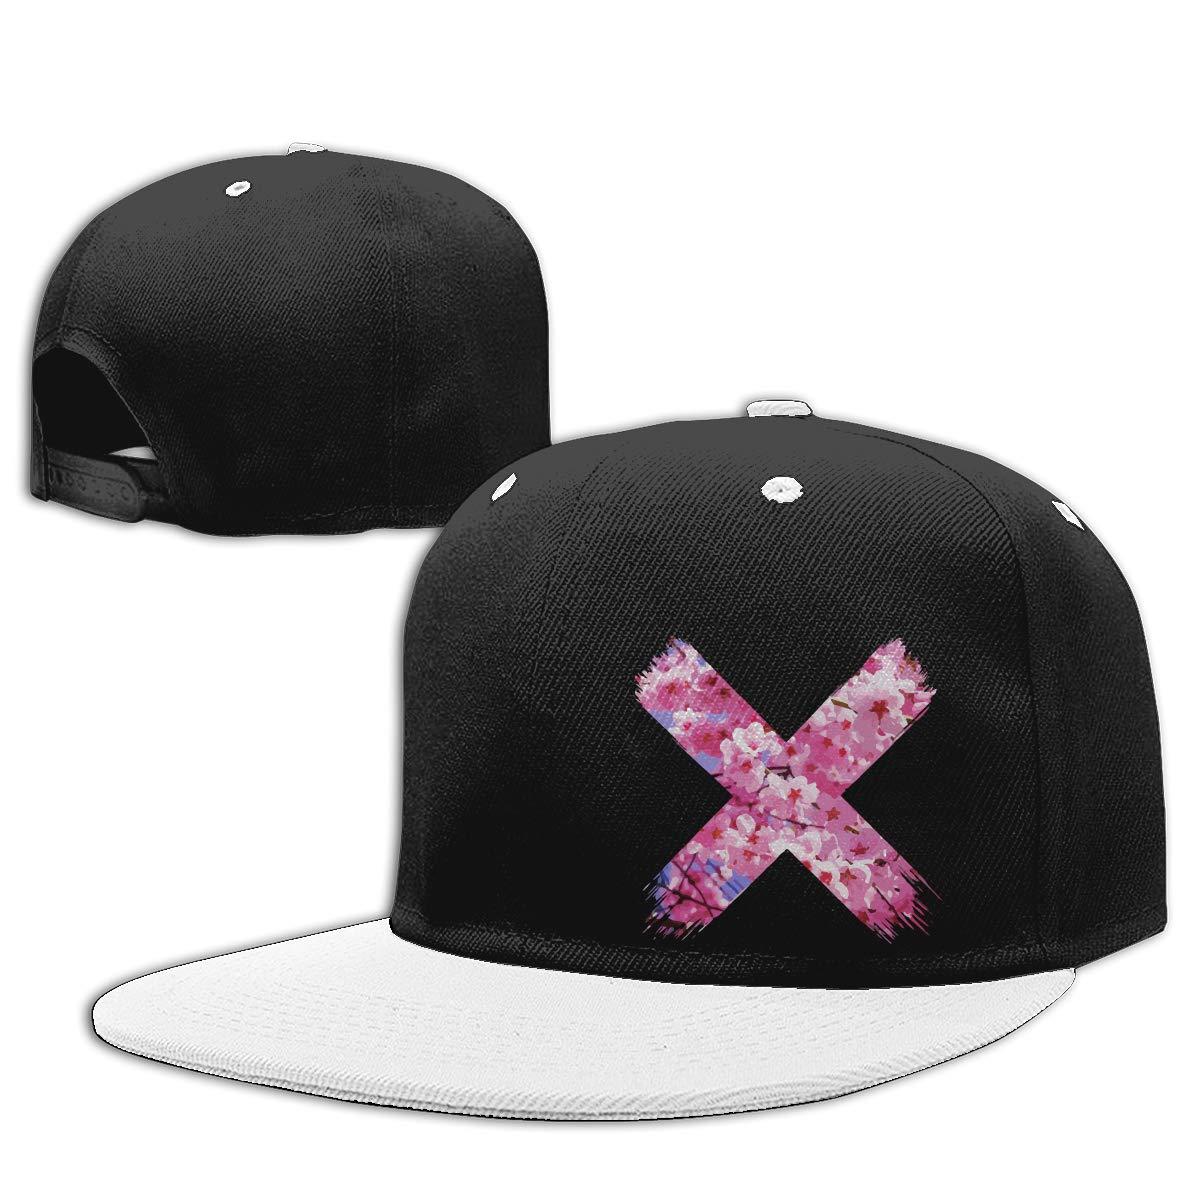 Sakura Flower Fashion Flat Peaked Baseball Caps NMG-01 Women Men Plain Cap